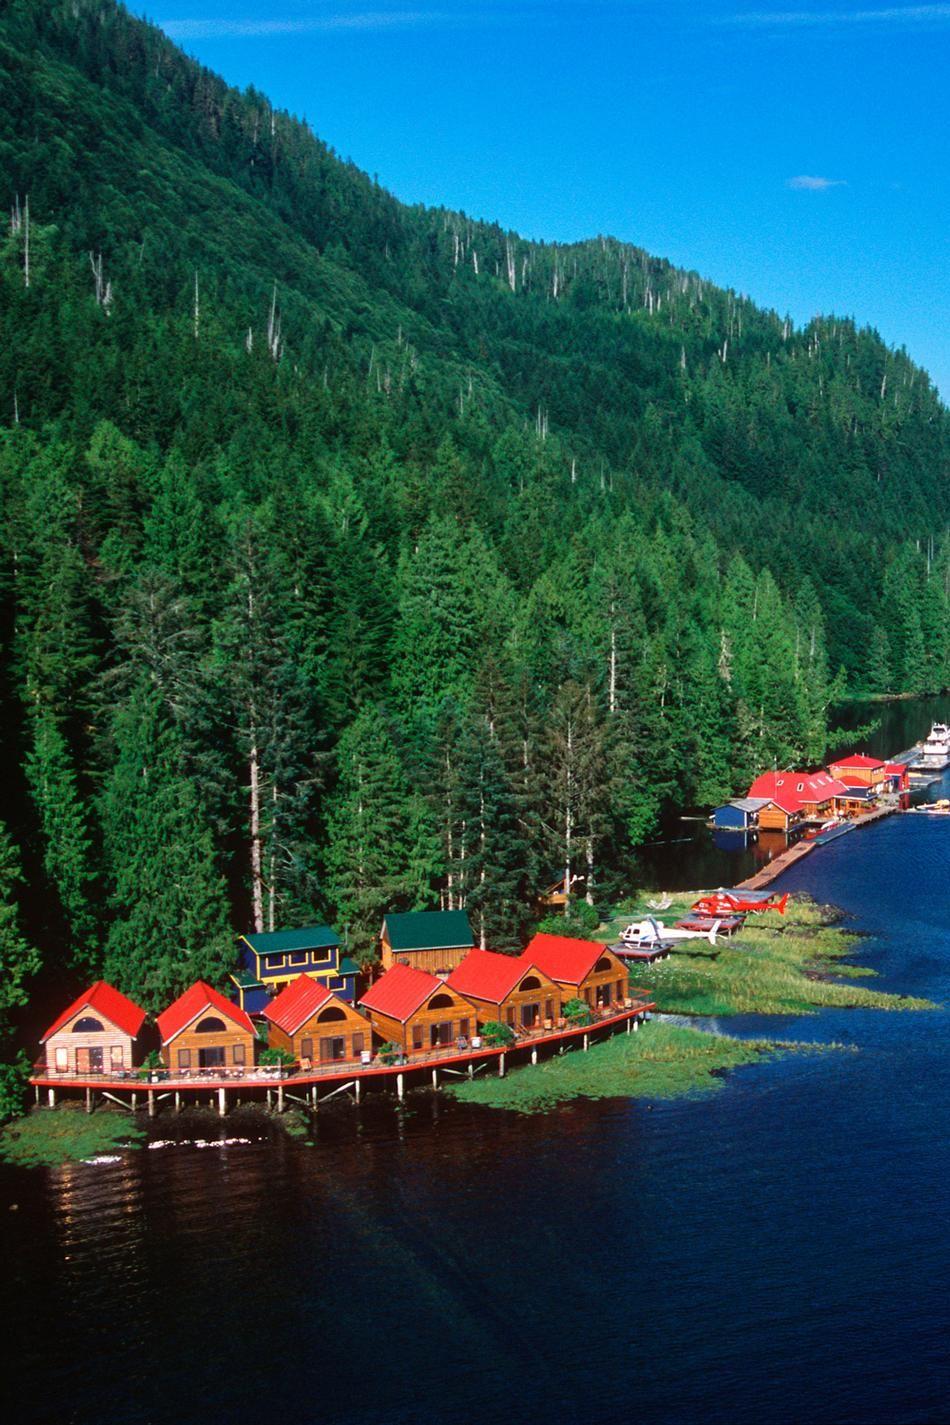 Nimmo Bay In British Columbia Canada So Beautiful Pin Up Live Pinterest British